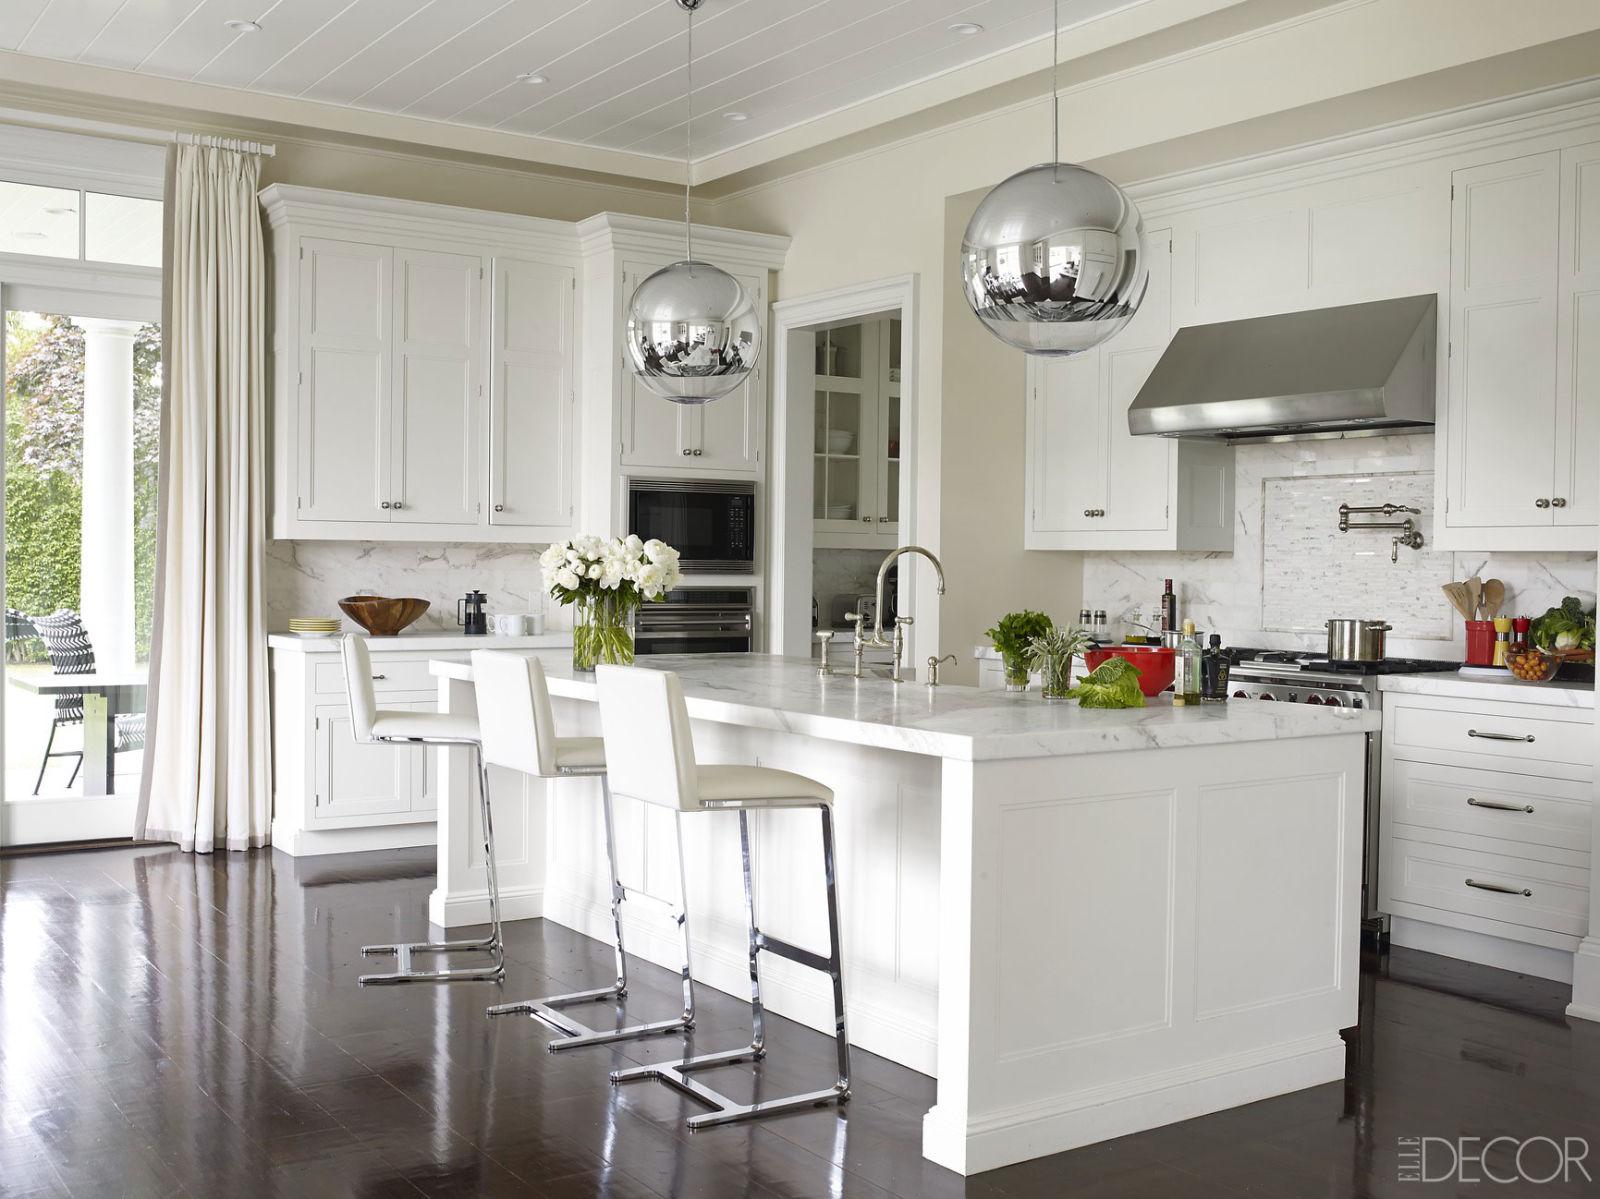 White Kitchen With Silver Spheres